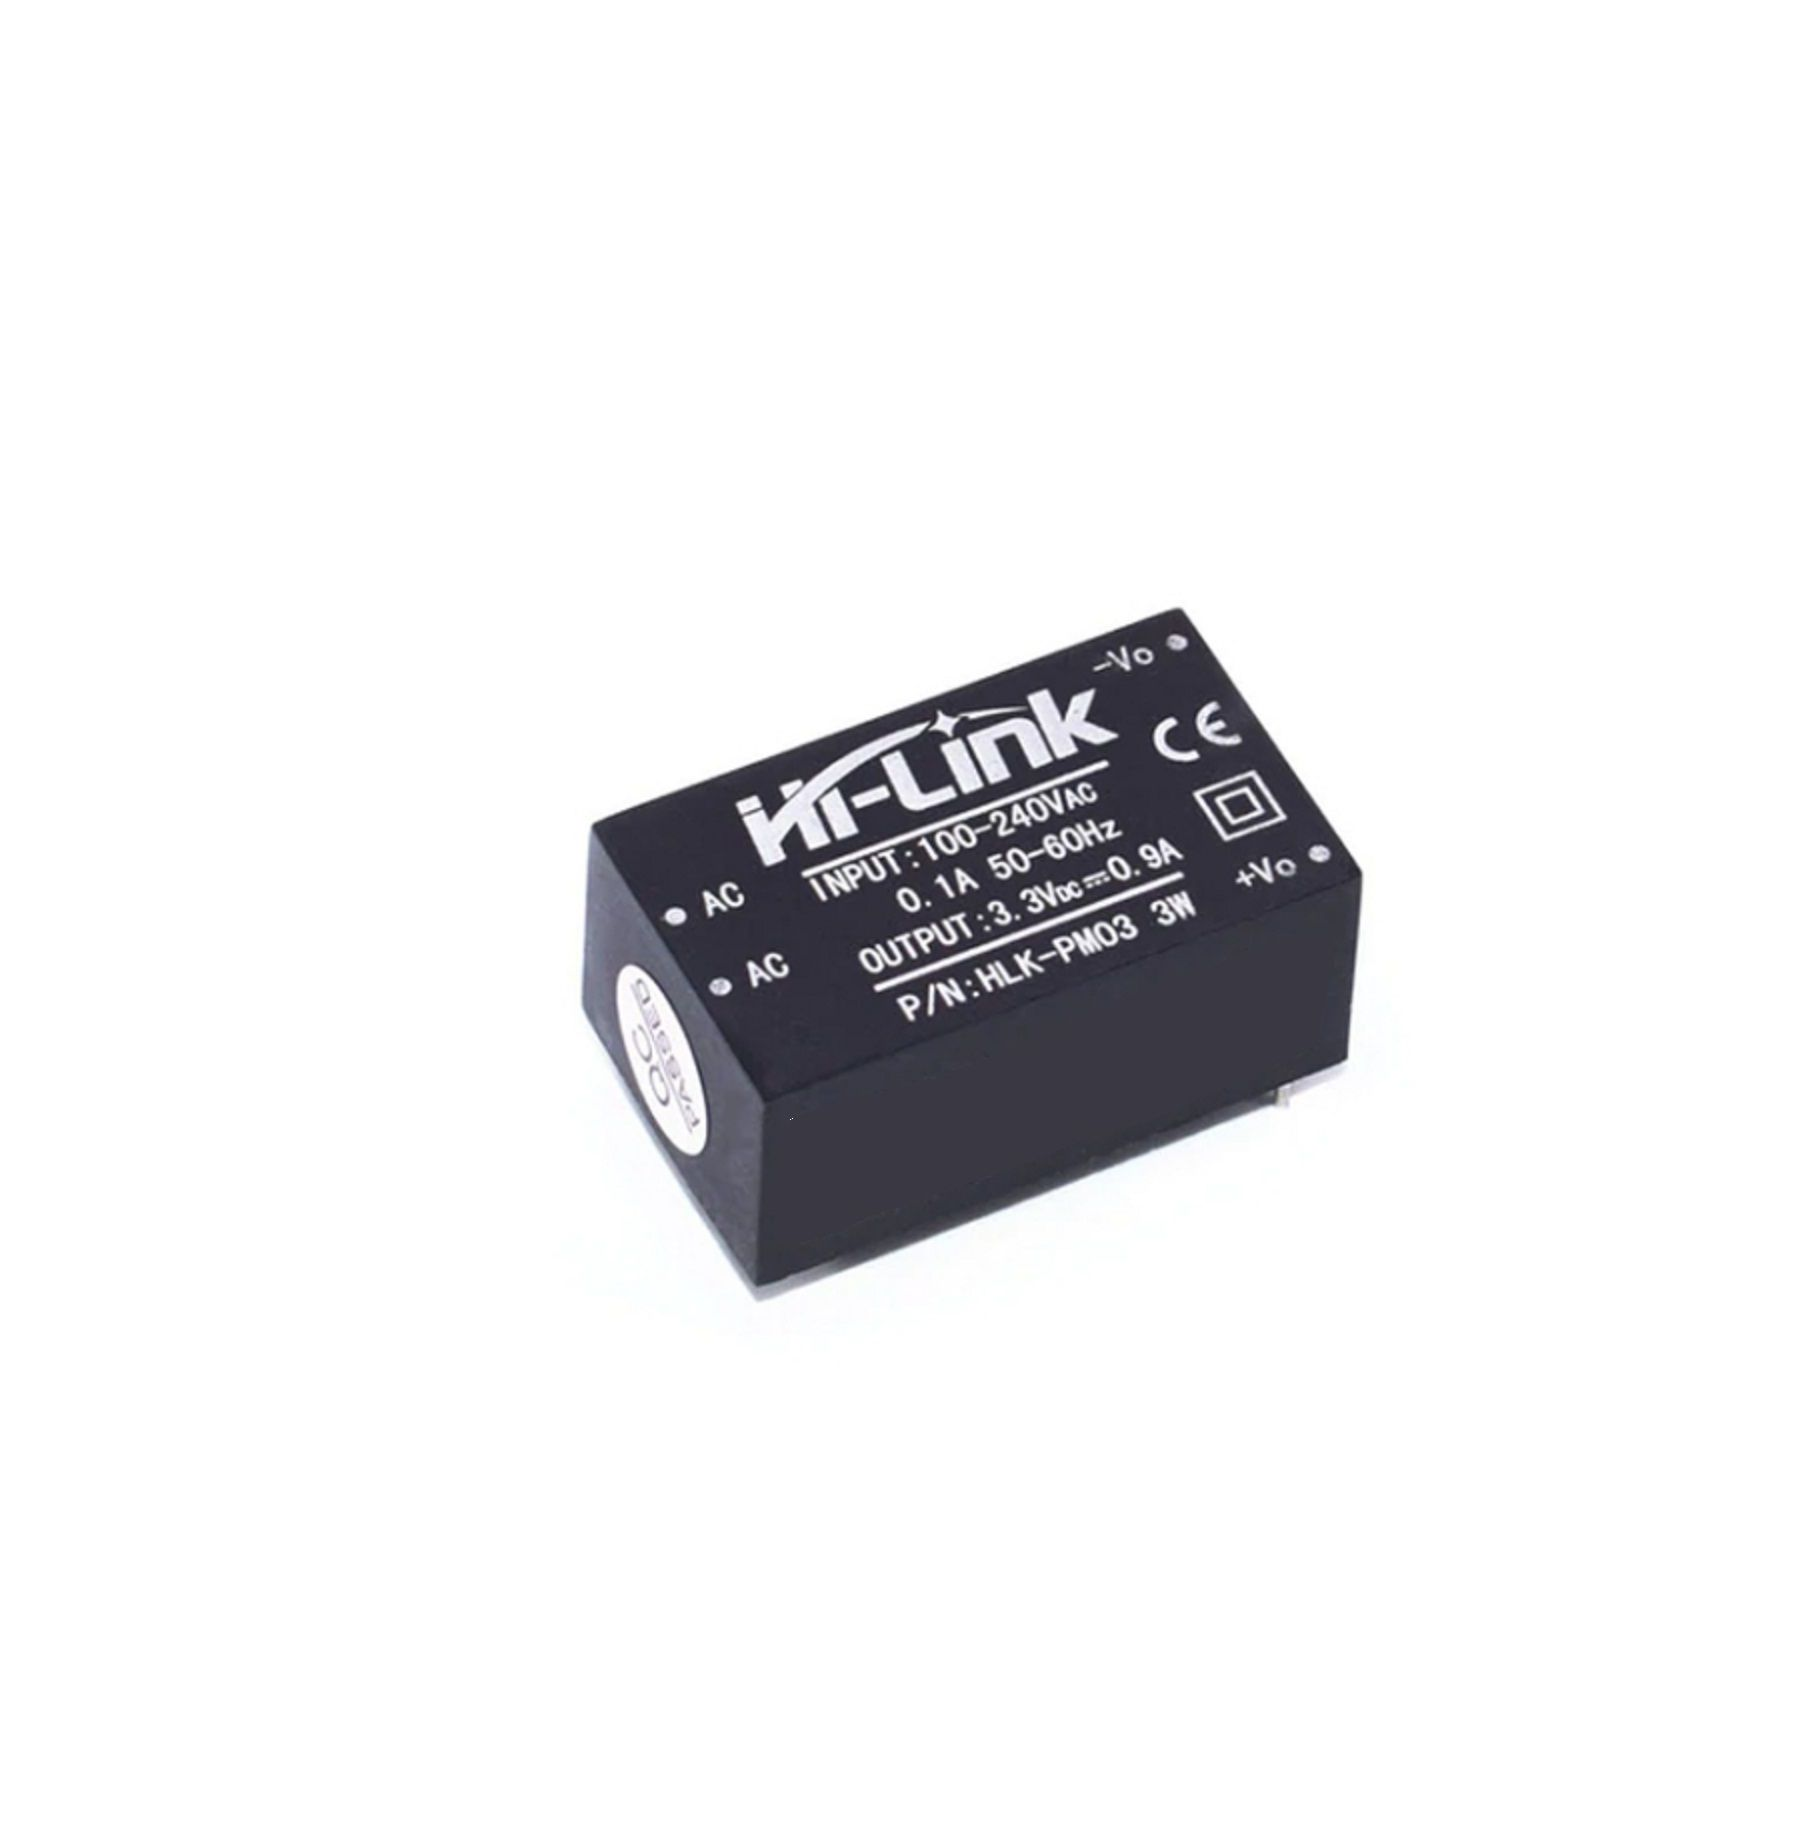 Mini Fonte Hi-link HLK-PM03 100~240VAC para 3.3V DC 800mA 3W